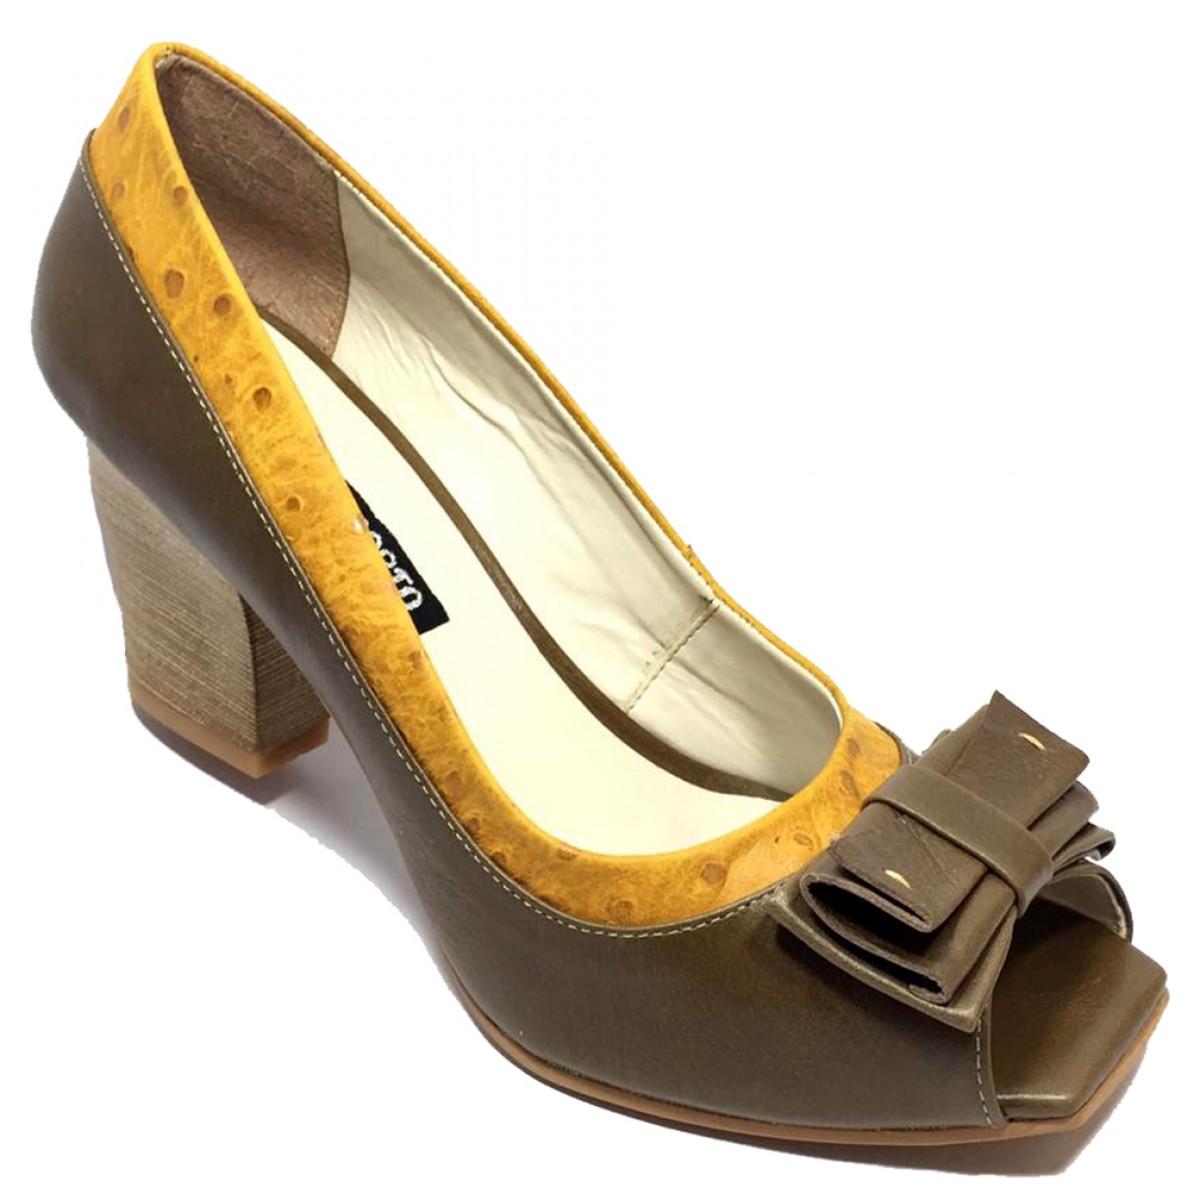 1d9d6470ca Sapato Feminino Peep Toe Cia do Porto Marrom Ave - Compre Agora ...